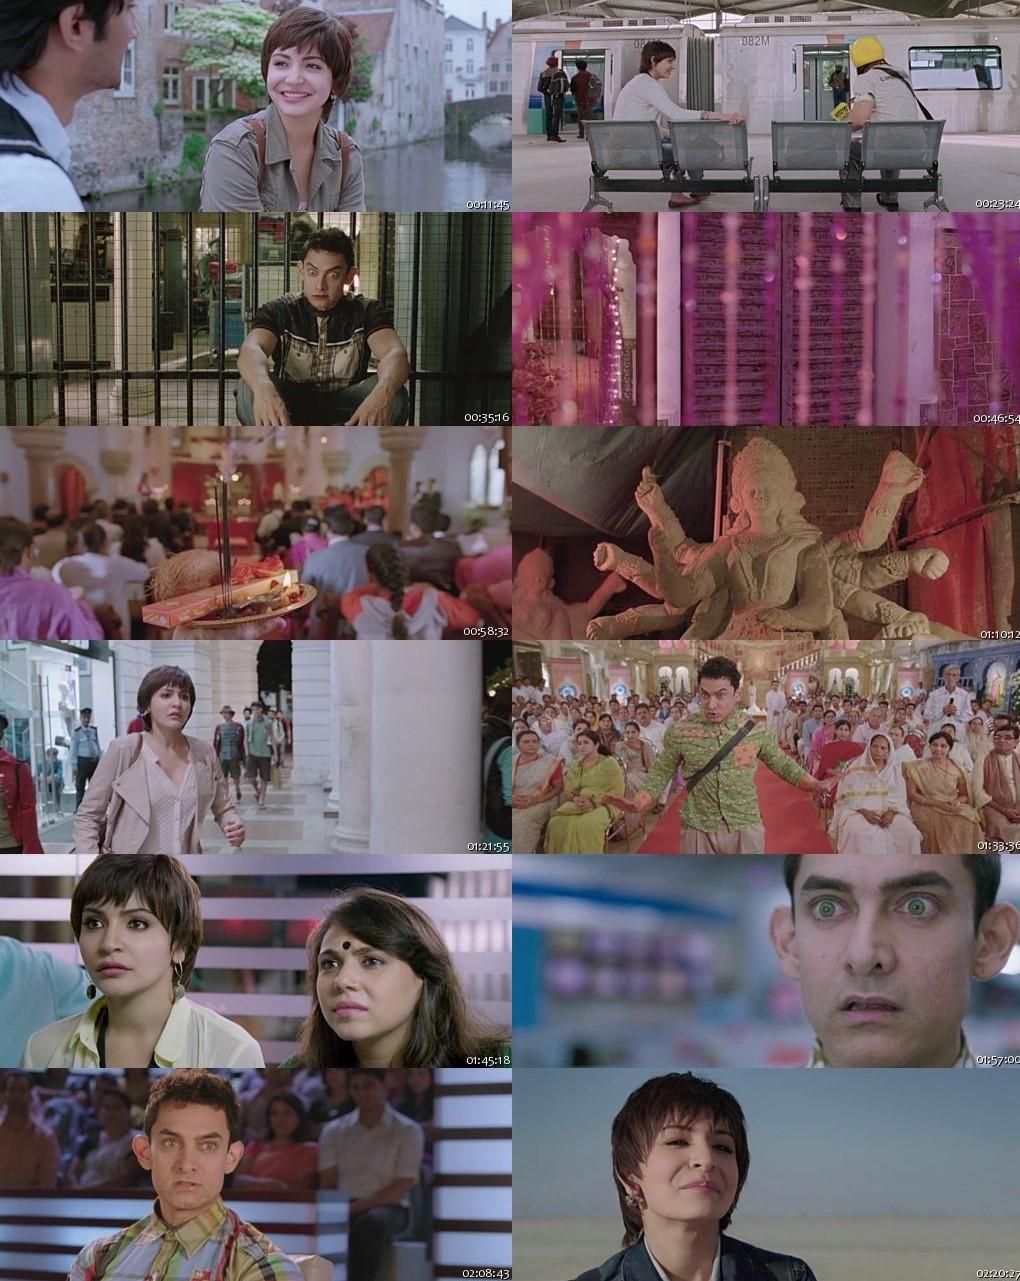 PK 2014 Full Hindi Movie Online Watch BRRip 720p